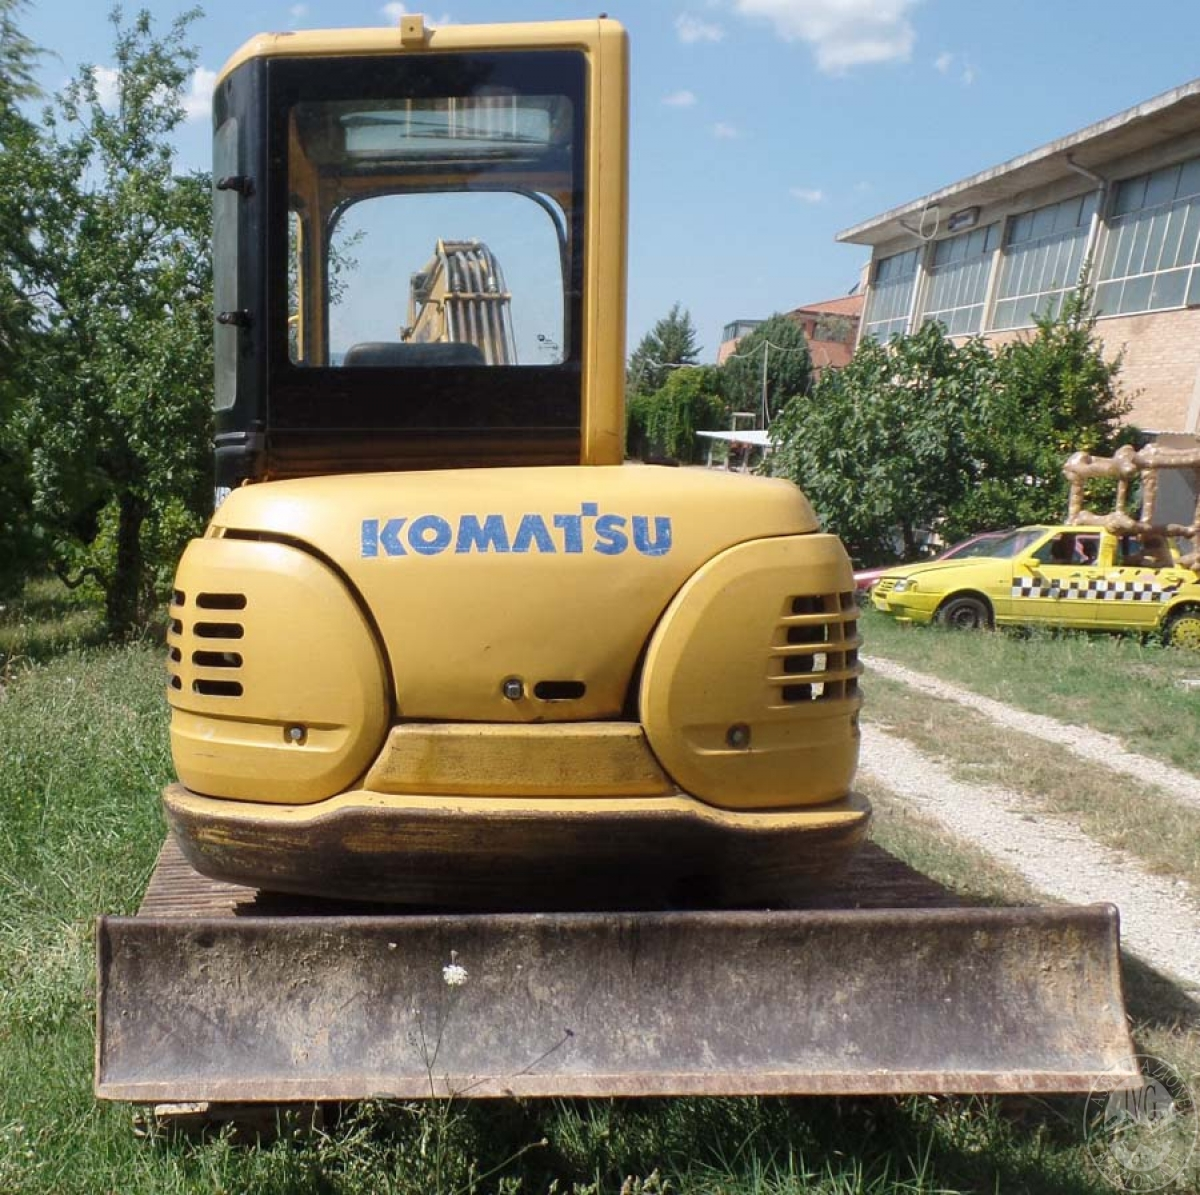 Escavatore Komatsu PC45R   GARA DI VENDITA 6 OTTOBRE 2018  VISIBILE PRESSO DEPOSITERIA IVG SIENA